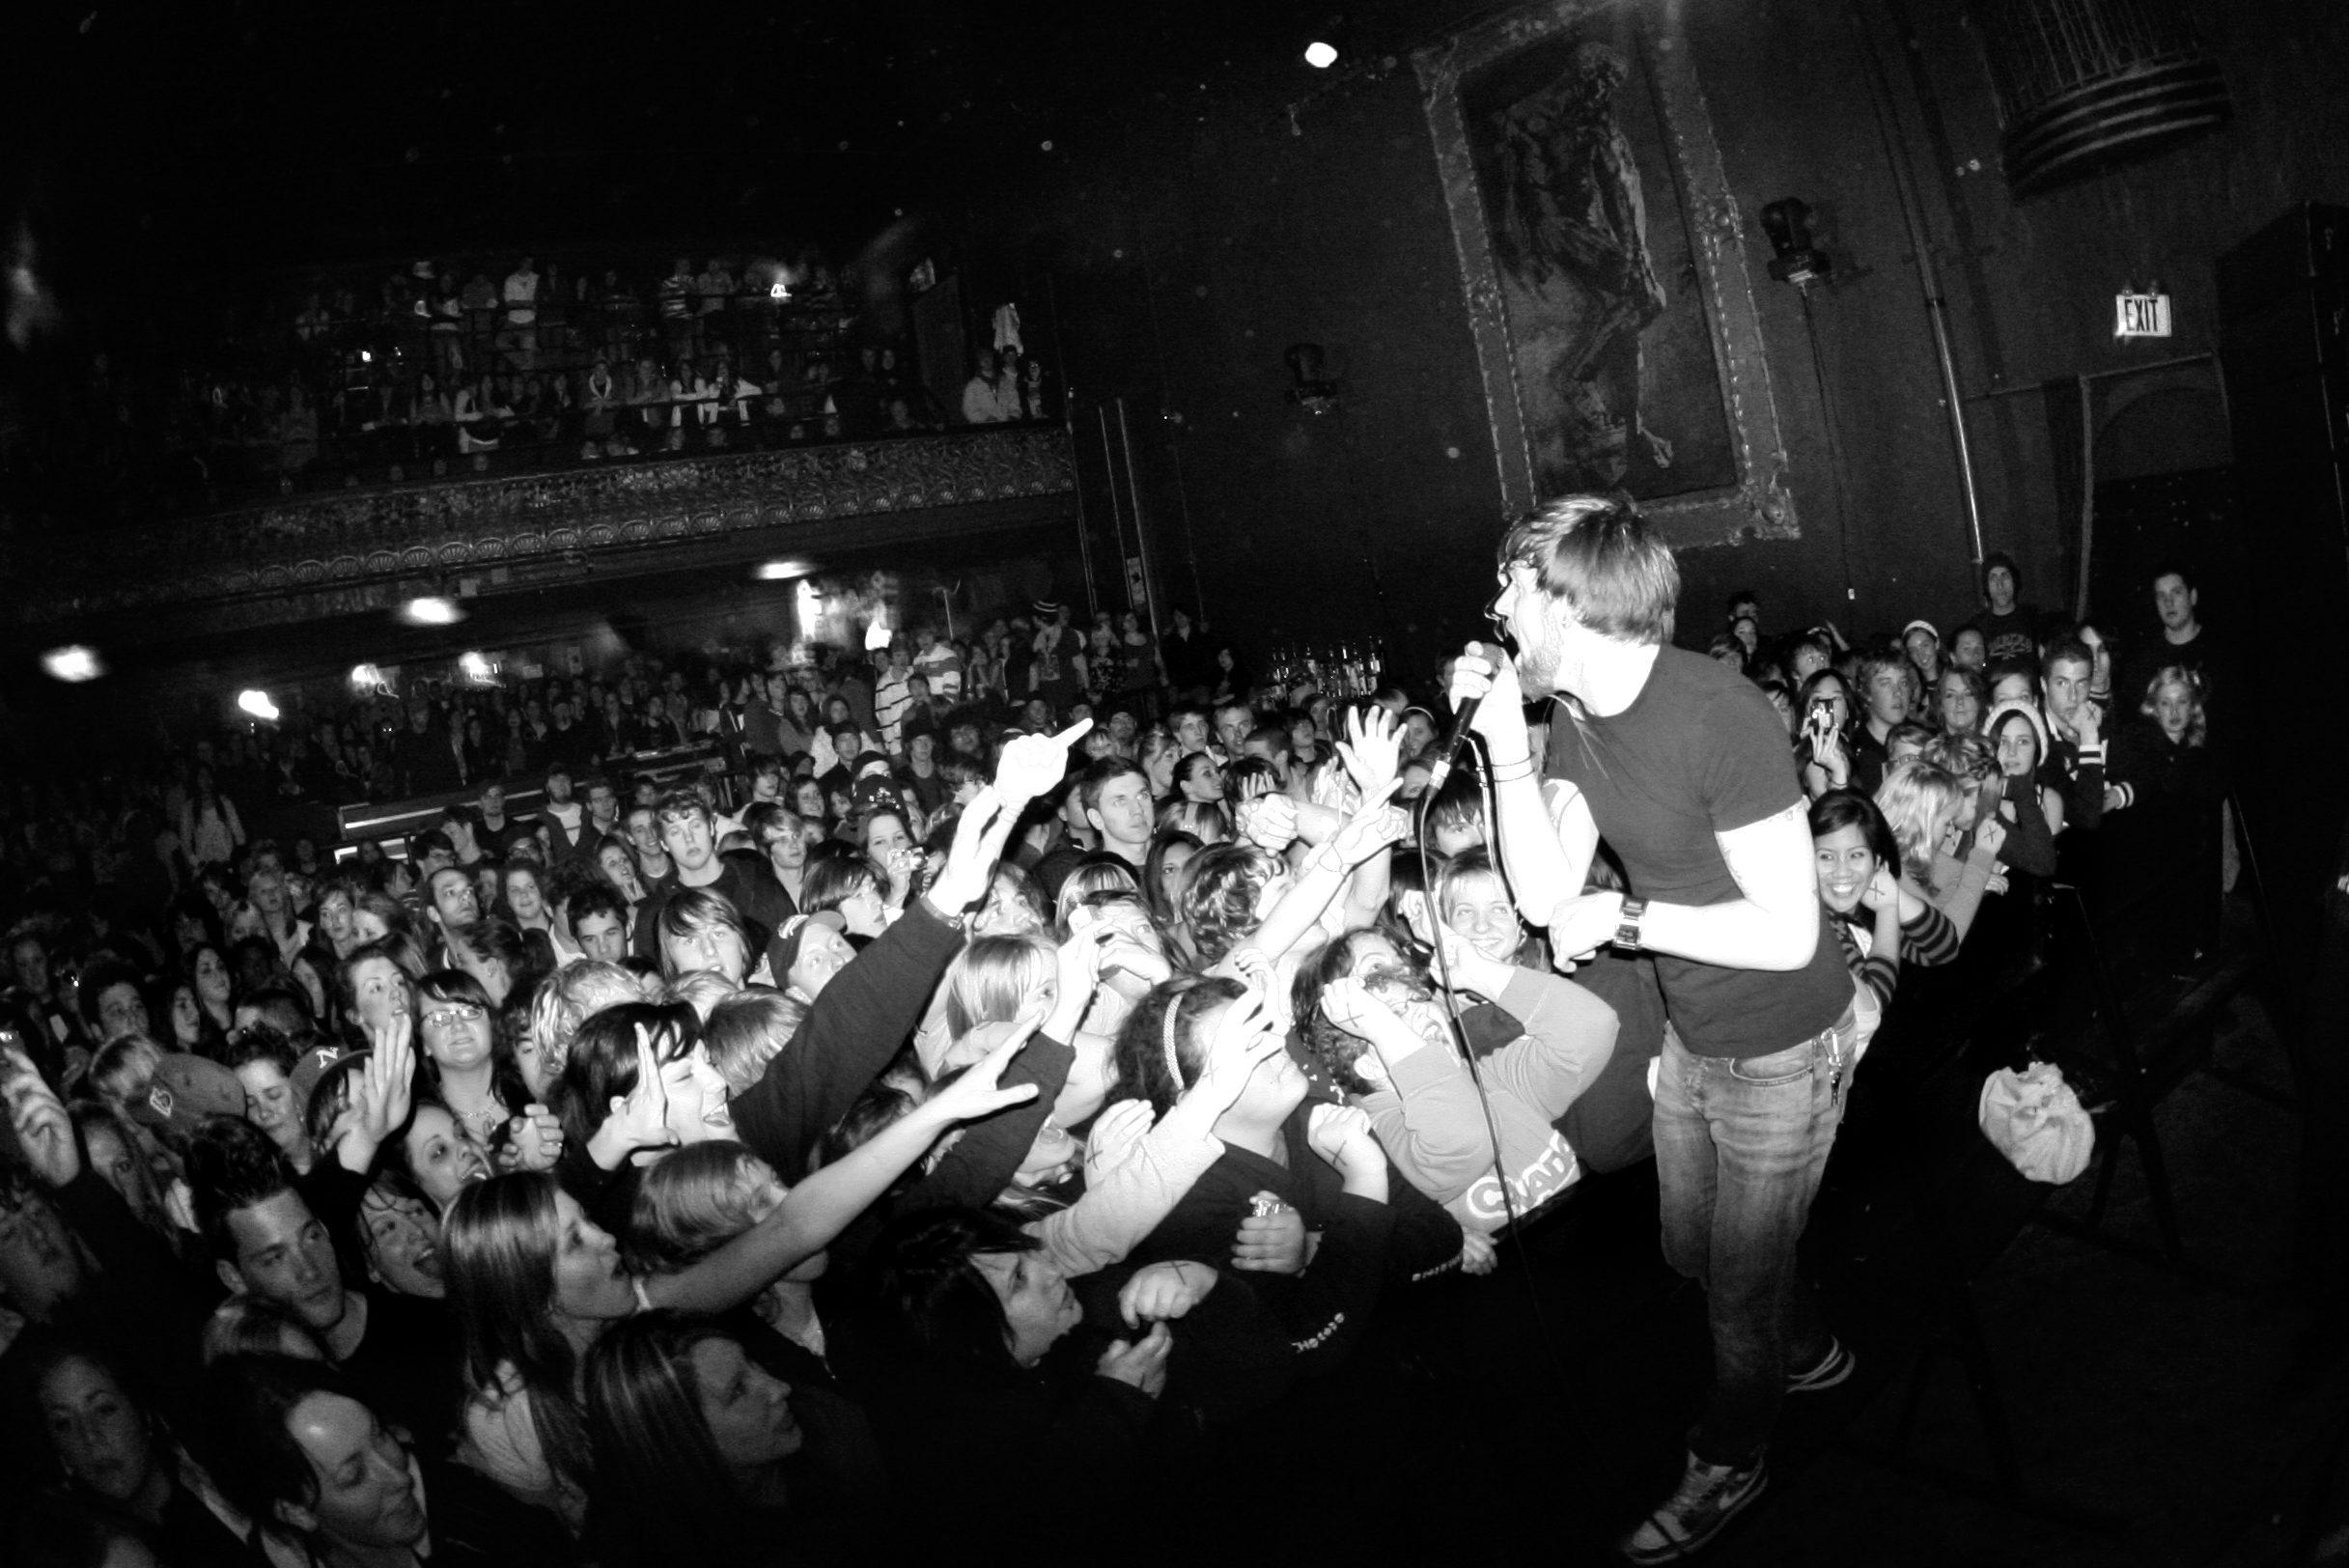 adam_opera_crowd